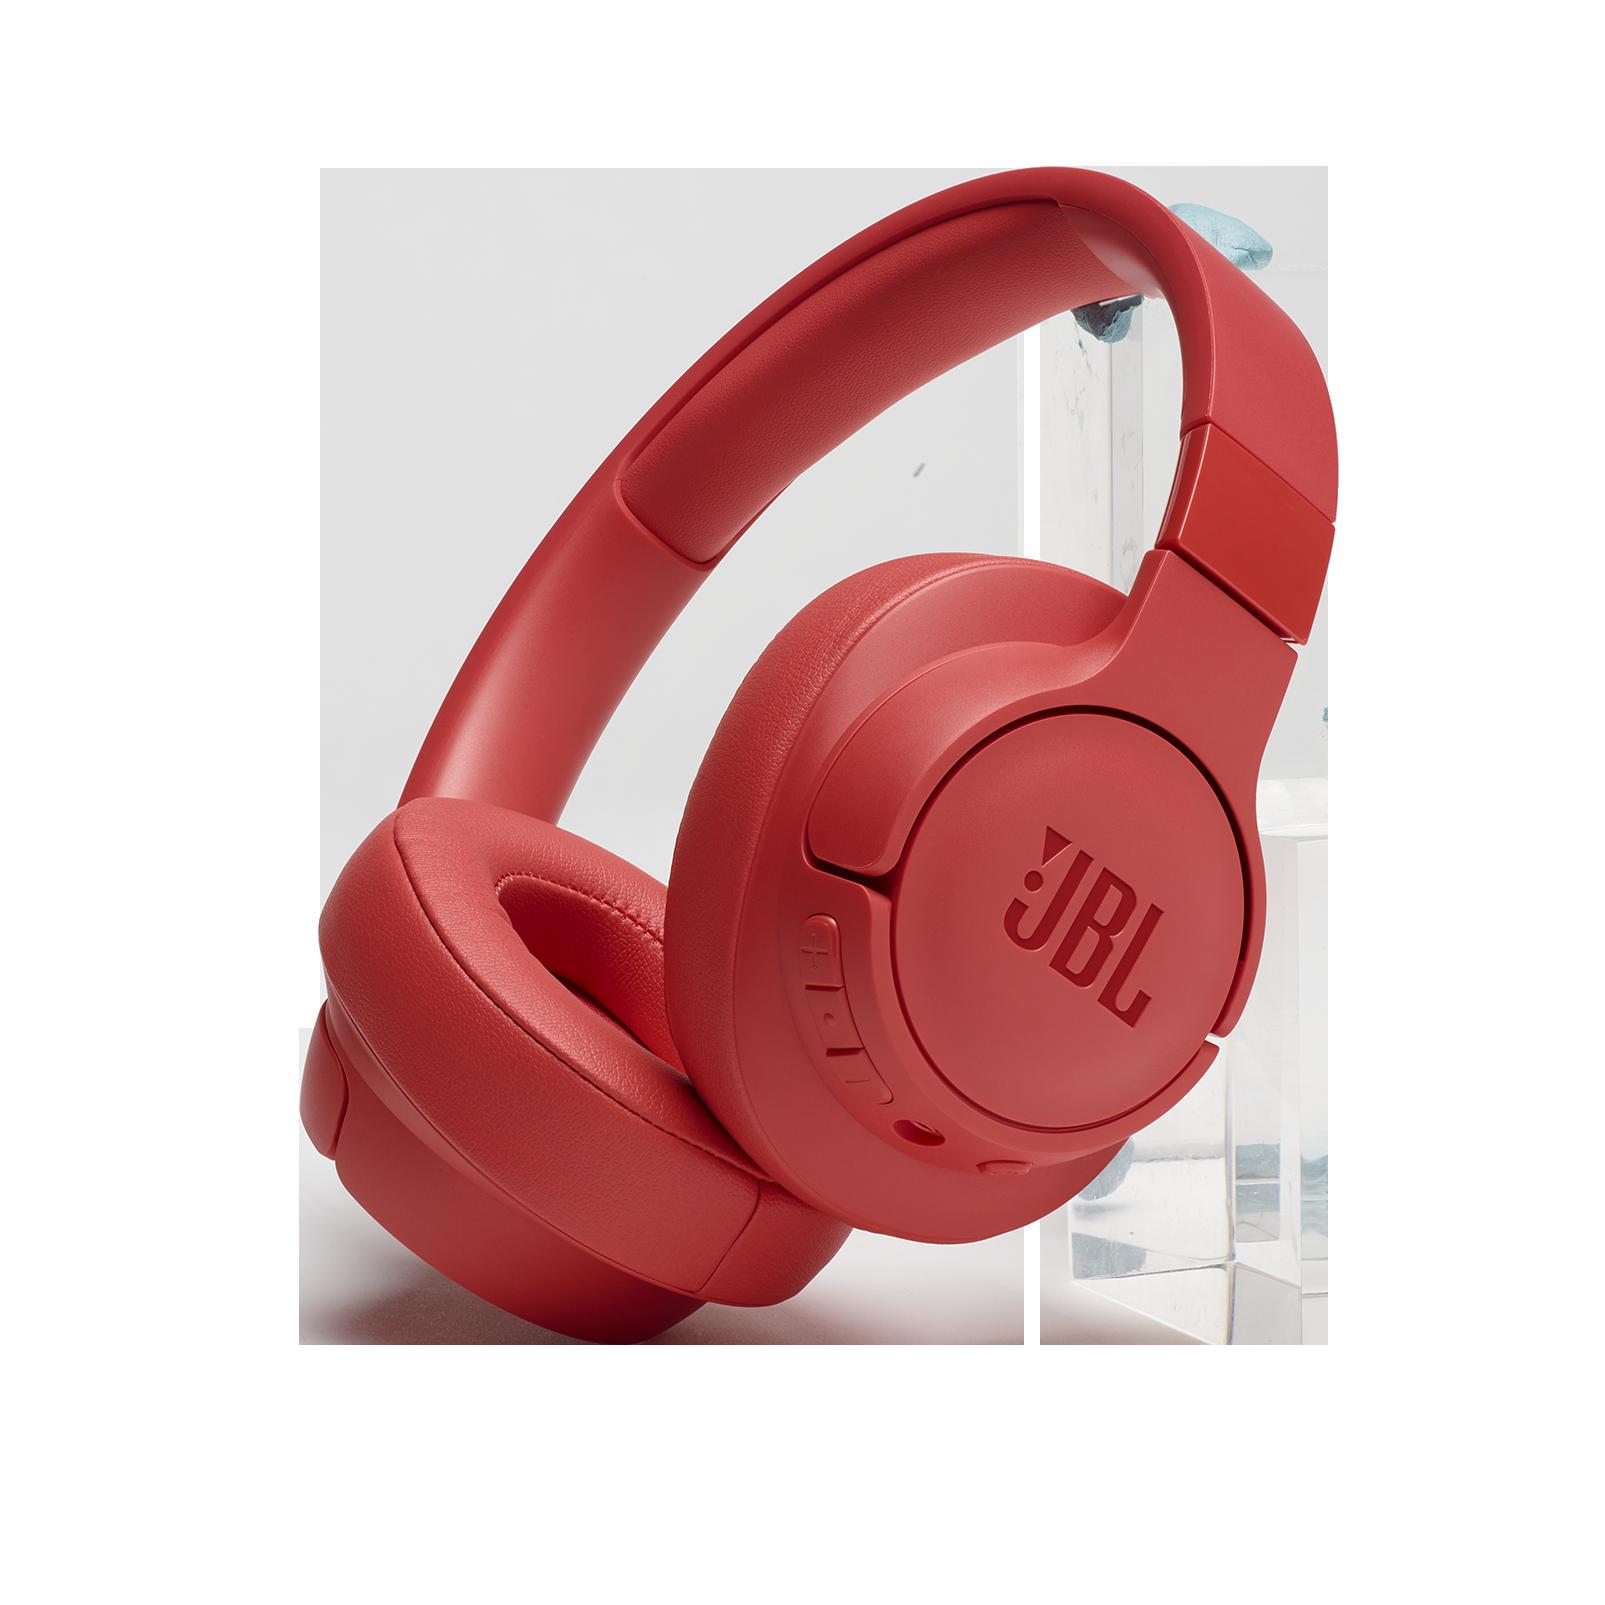 JBL TUNE 700BT - Coral Orange - Wireless Over-Ear Headphones - Hero